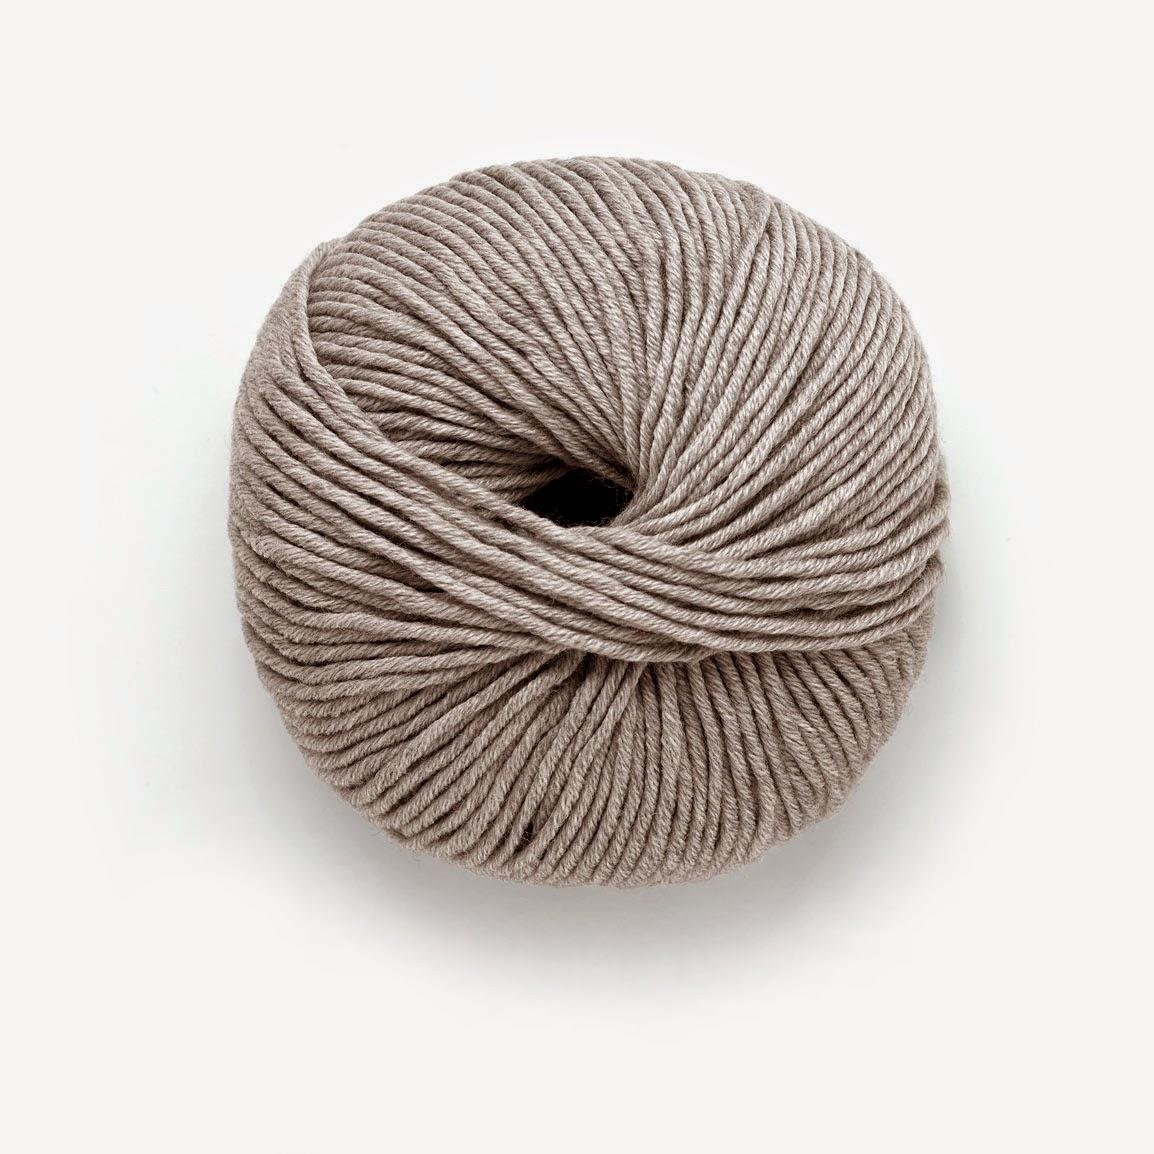 http://millamia.com/yarn.php?type=Aran&range=brights&id=36